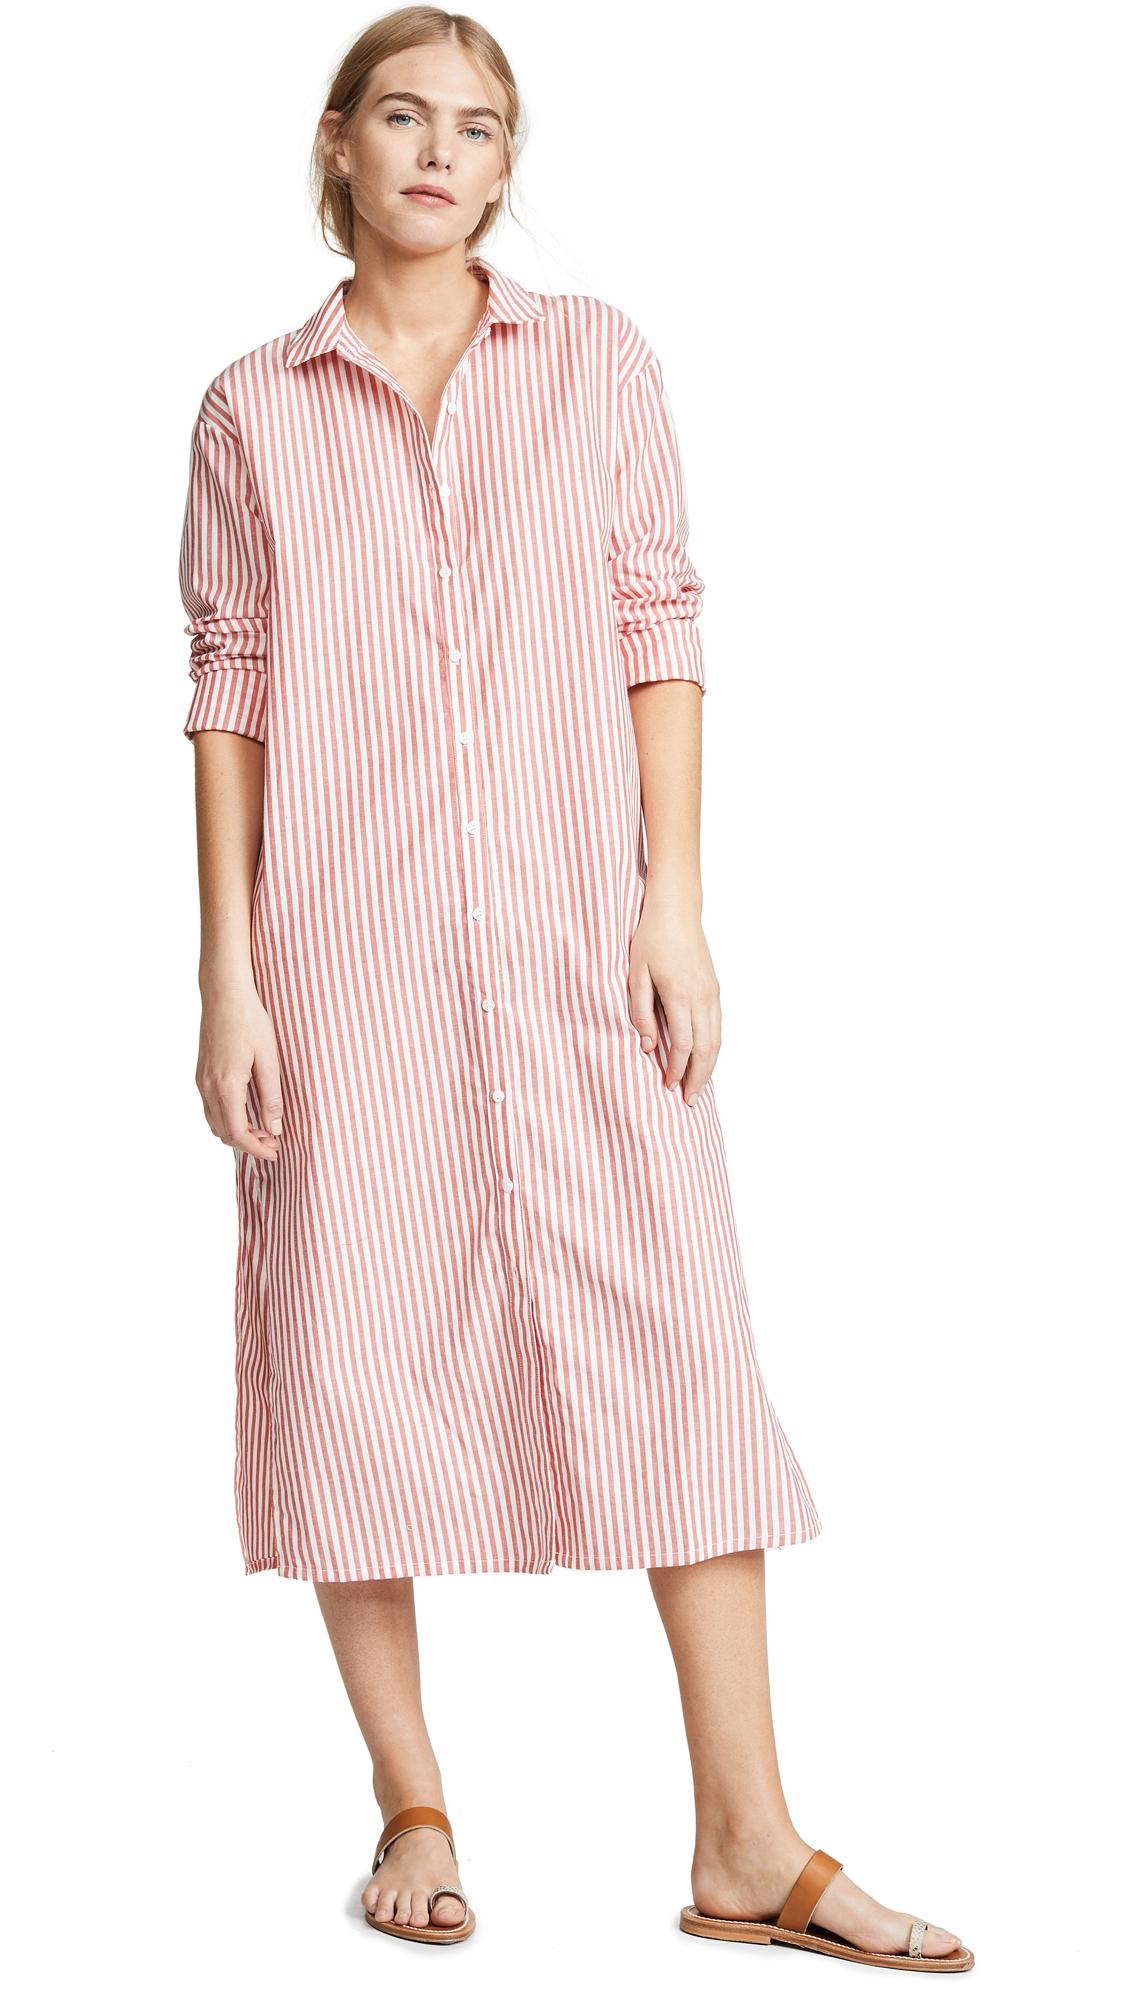 Stateside Oxford Shirtdress - Coral Stripe